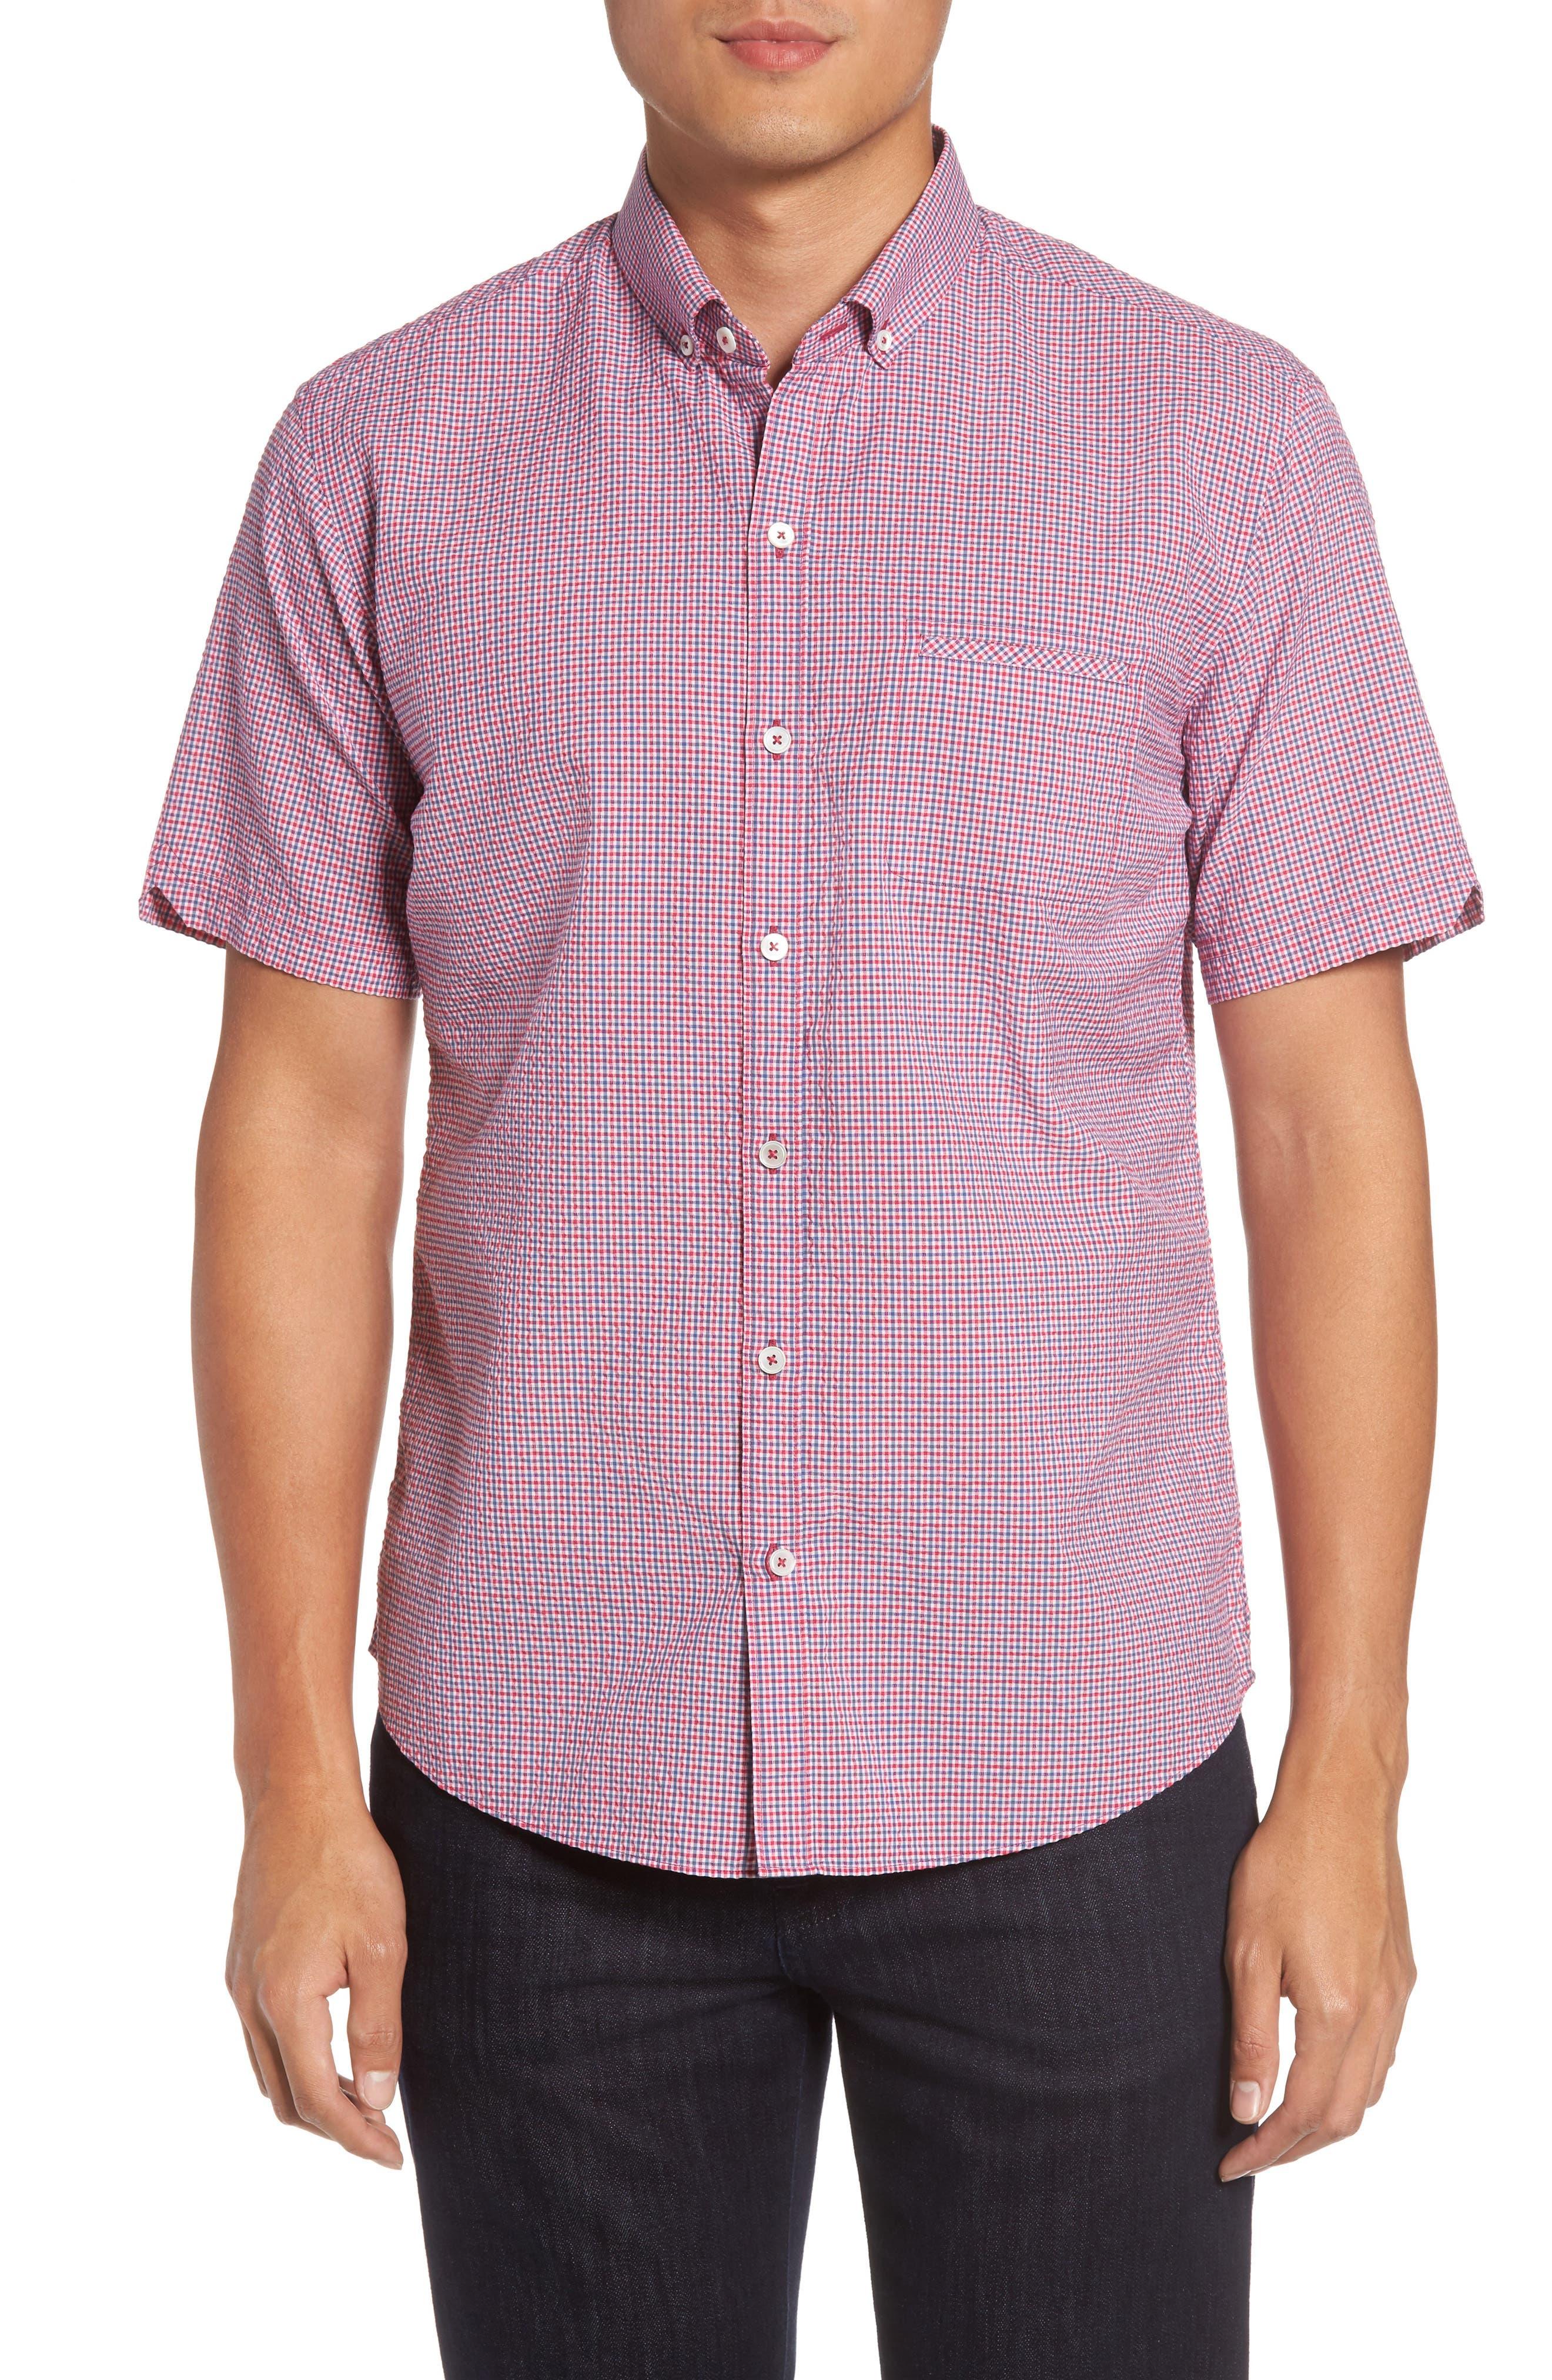 Billy Trim Fit Plaid Sport Shirt,                         Main,                         color, Berry